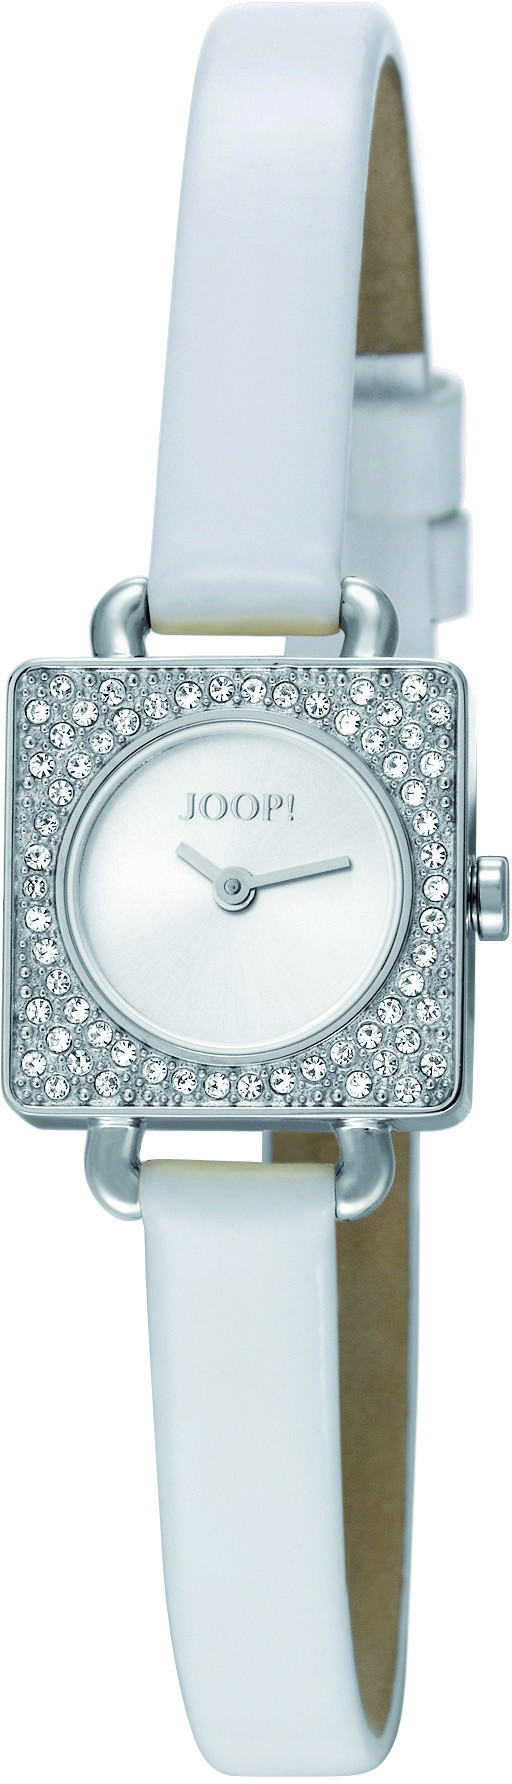 Joop! Neoclassic Square JP100962F03 Elegante Herre